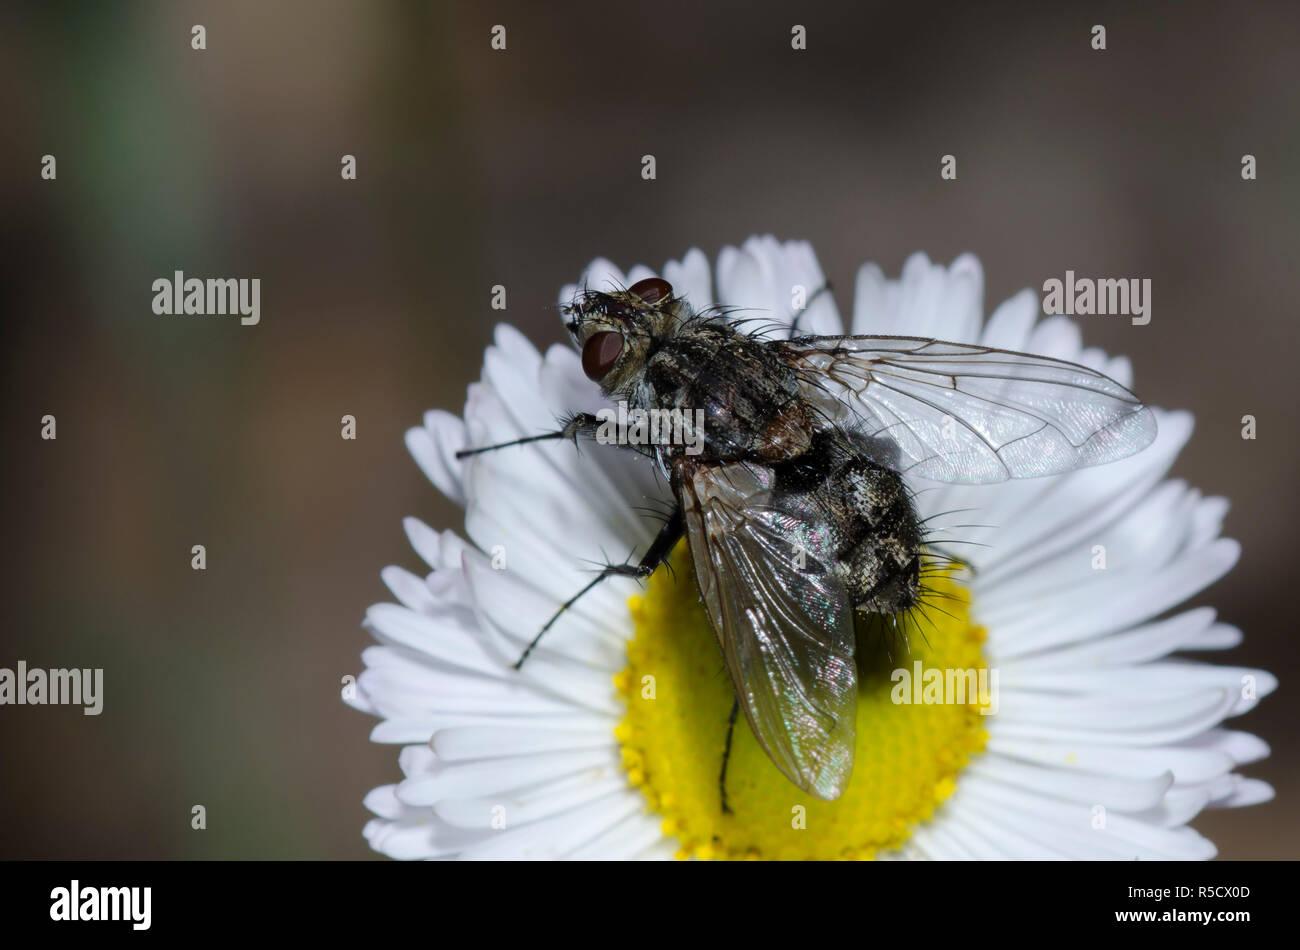 Tachinid Fly, Tribe Dexiini, on Trailing Fleabane, Erigeron flagellaris Stock Photo